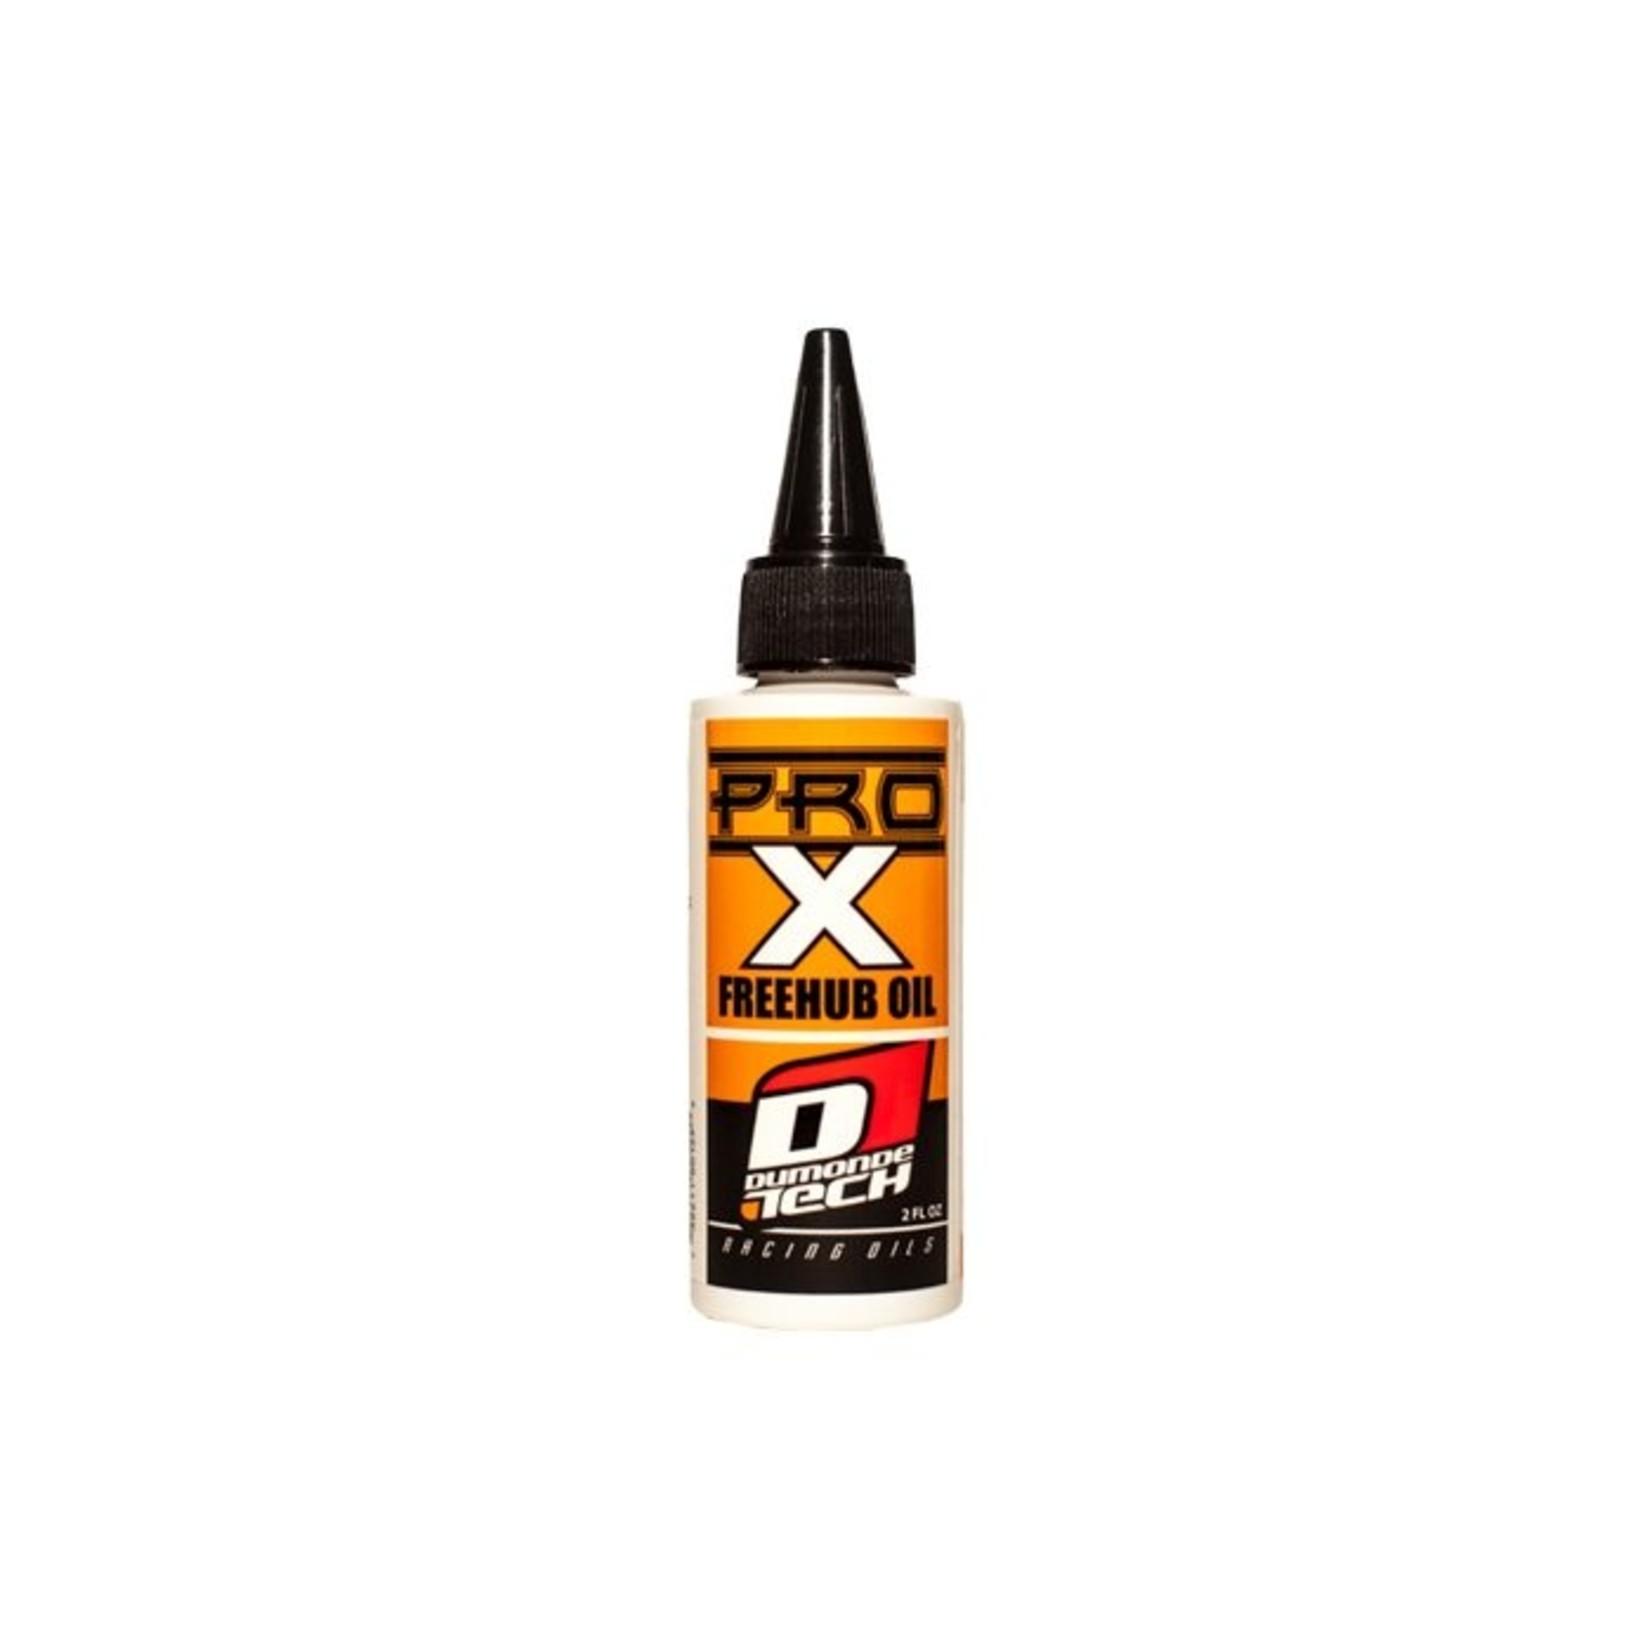 Dumonde Dumonde Pro X Freehub Oil 2oz Bottle (60mL)